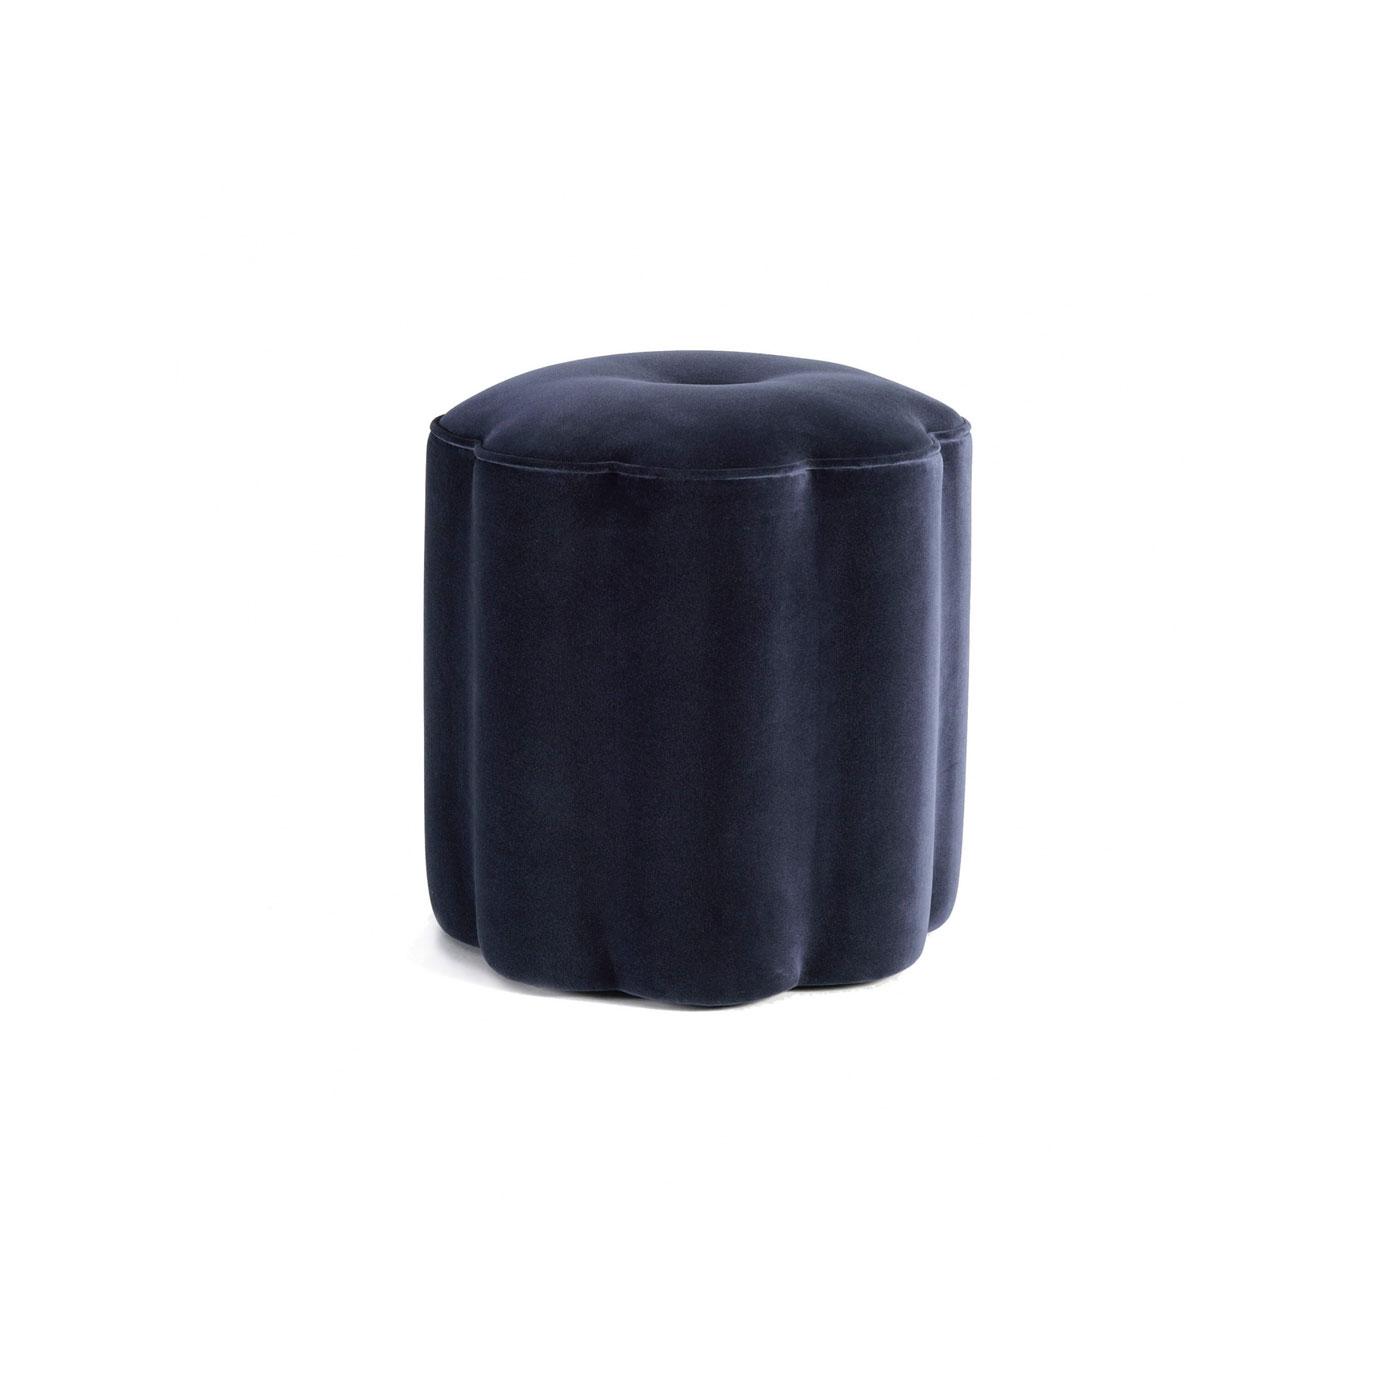 A dark blue footstool.